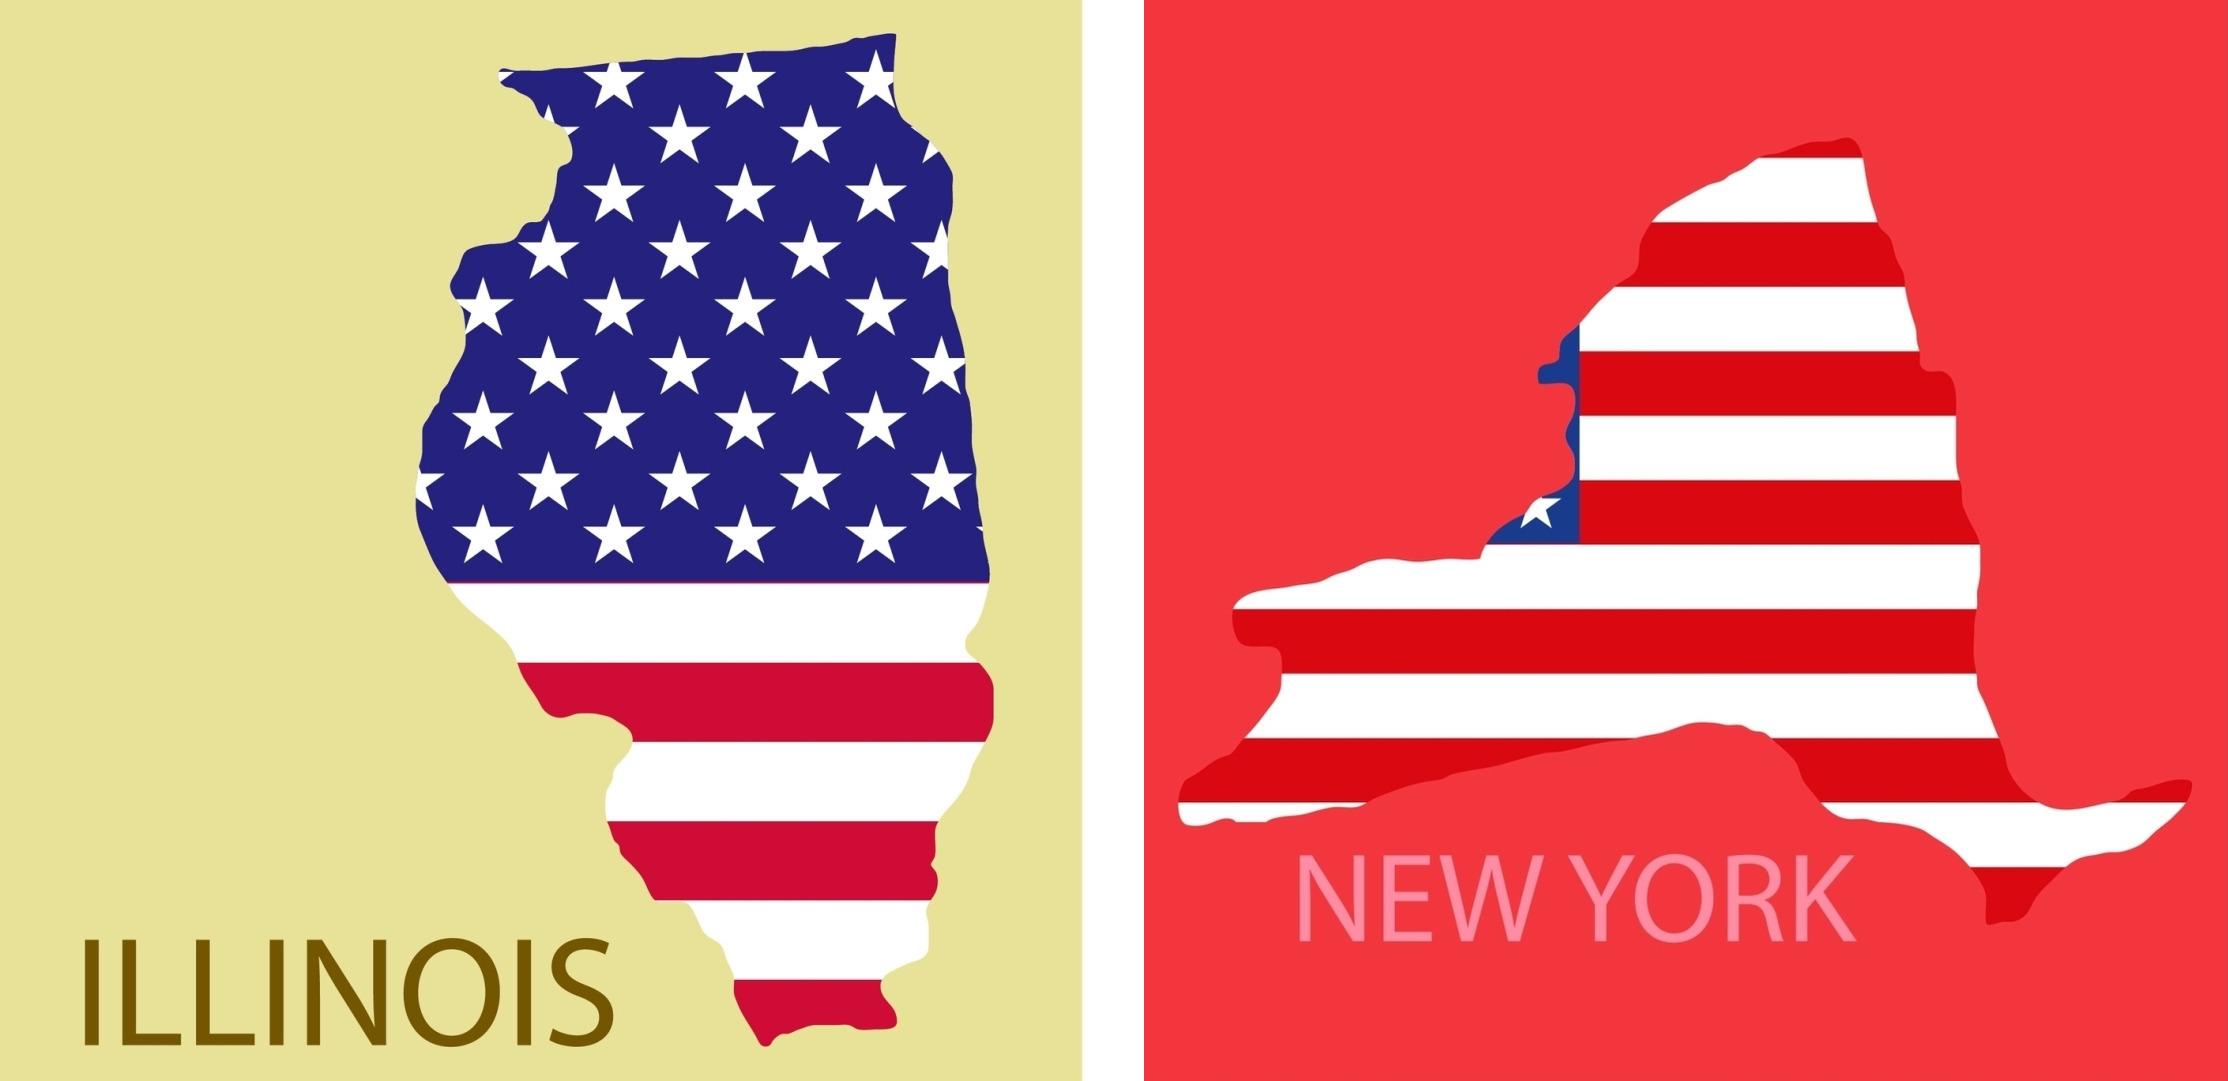 Fine Art Shippers Offers Art Shuttle Illinois – New York